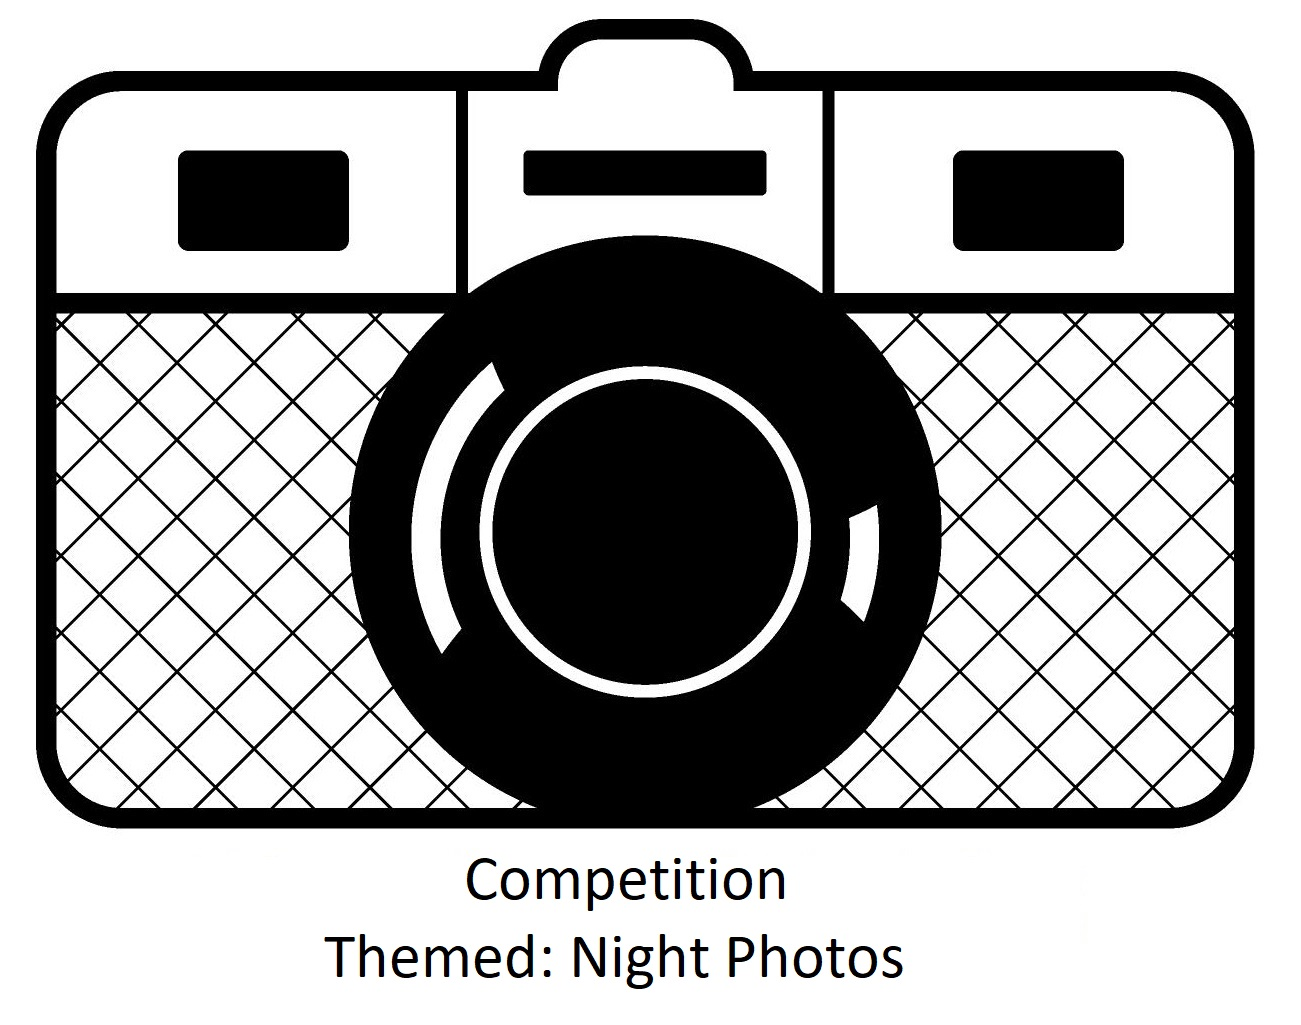 Camera_Competition_NightPhotos.jpg